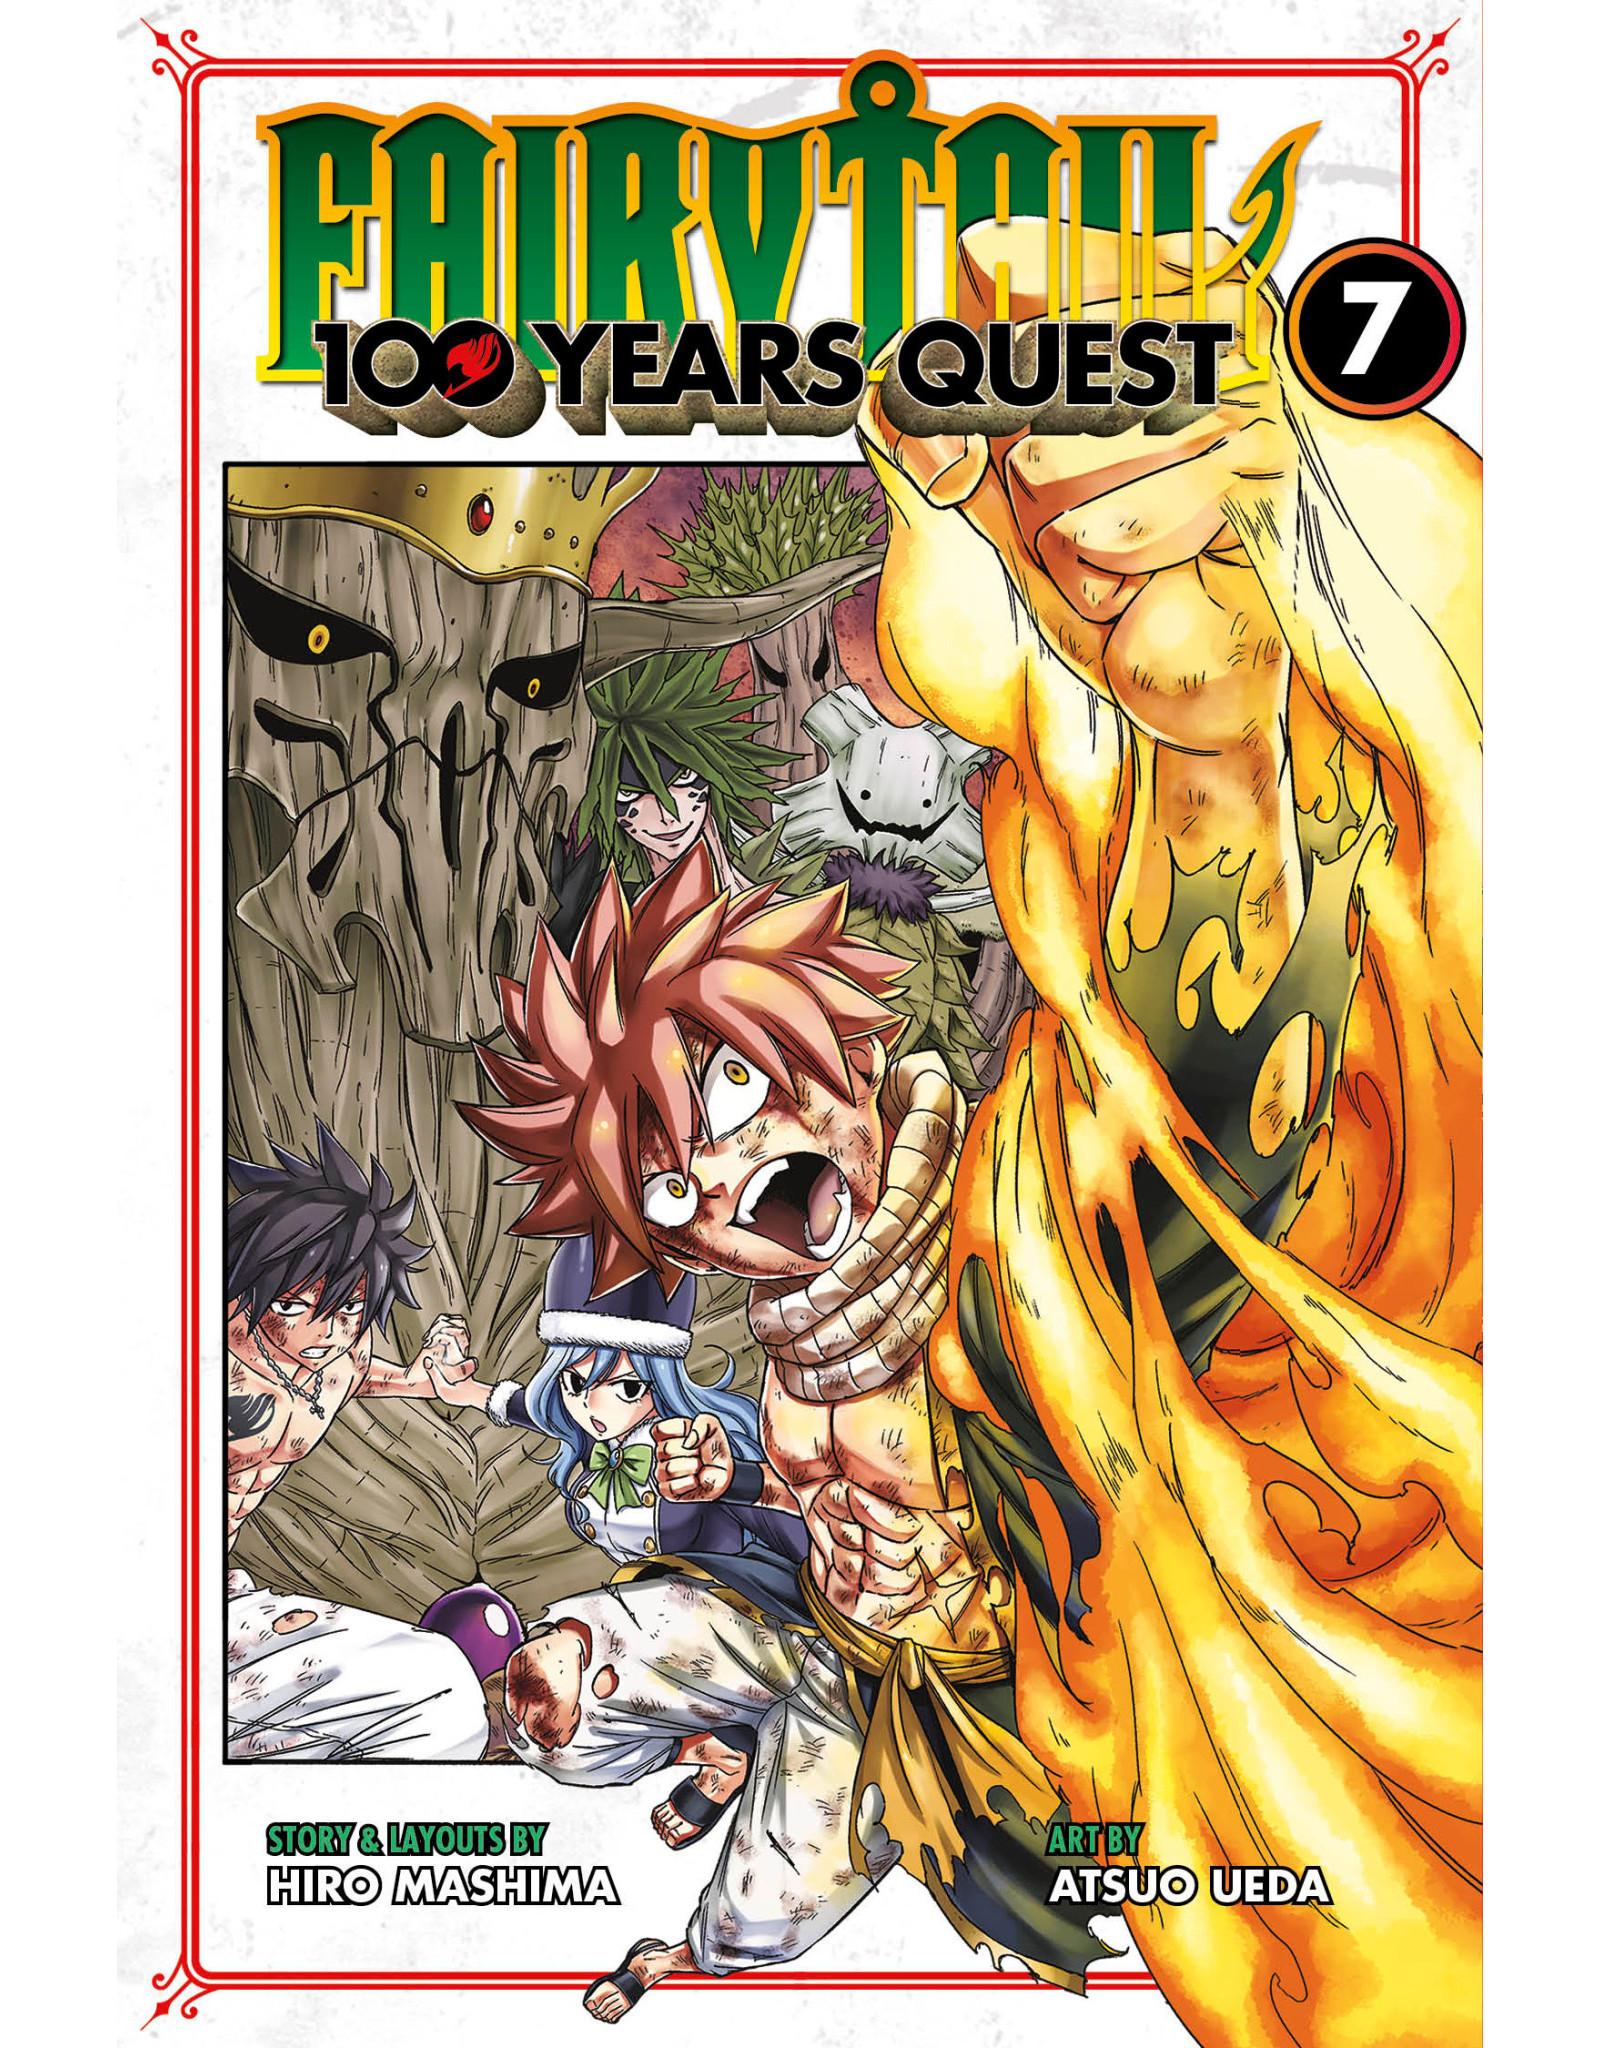 Fairy Tail: 100 Years Quest 07 (Engelstalig) - Manga